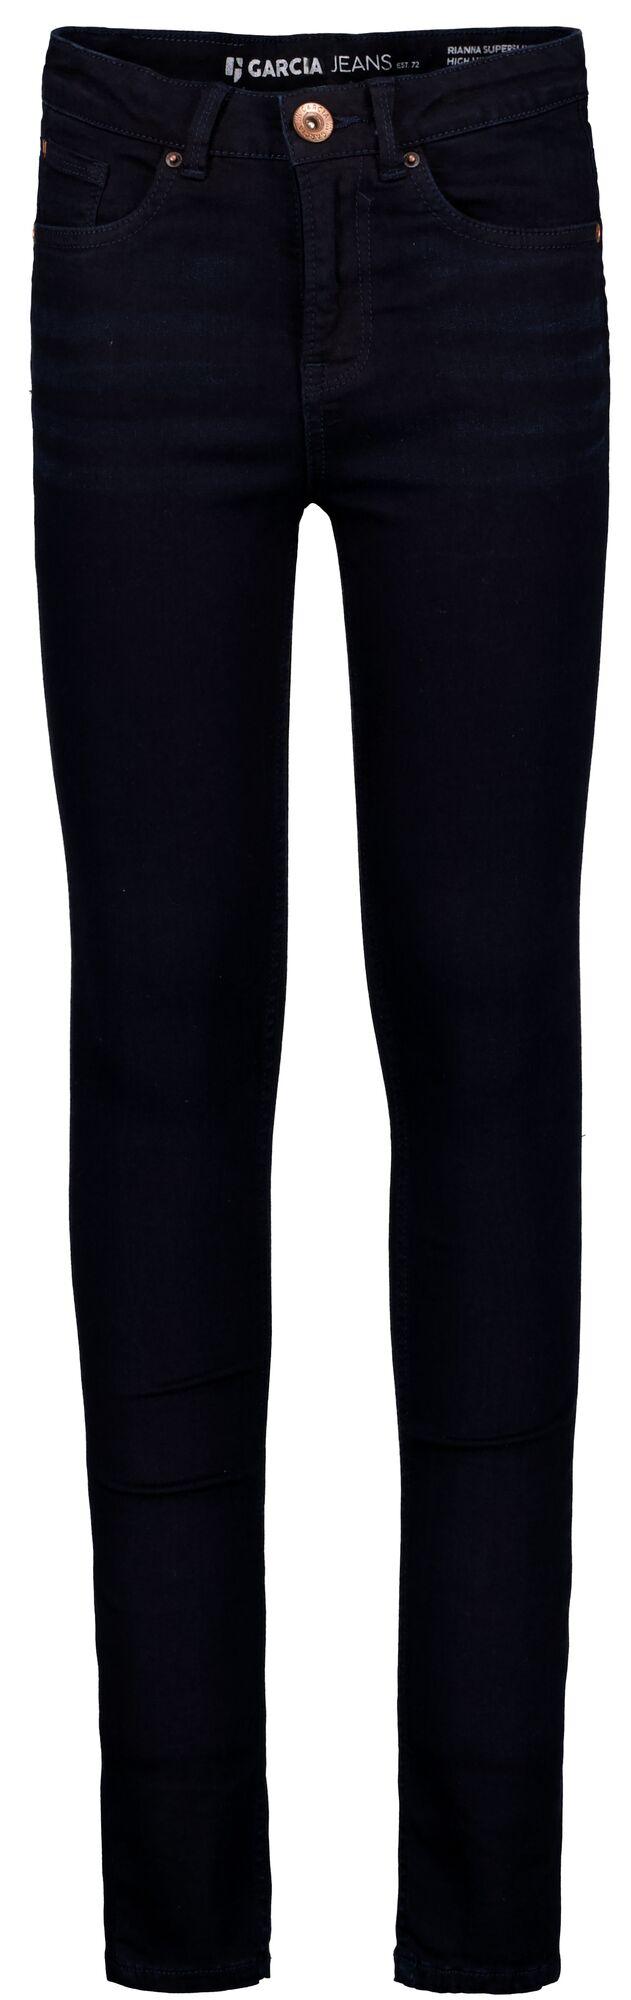 Garcia Mädchen Jeans Hose Gr 128-176 Rianna superslim fit Skinny high waist